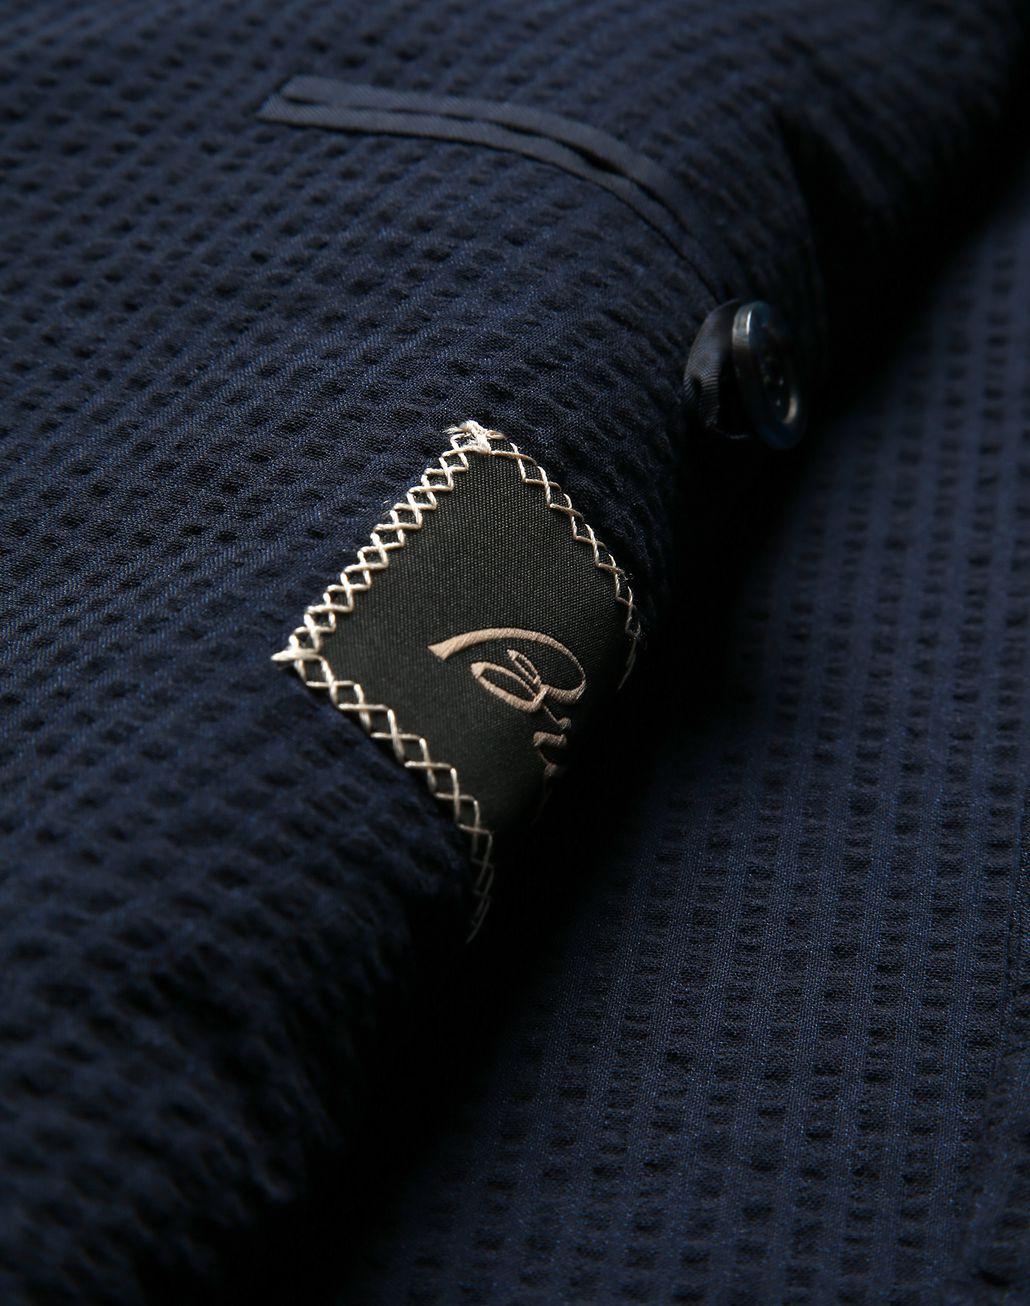 BRIONI Navy Blue Seer Sucker Celio Suit Suits & Jackets Man b